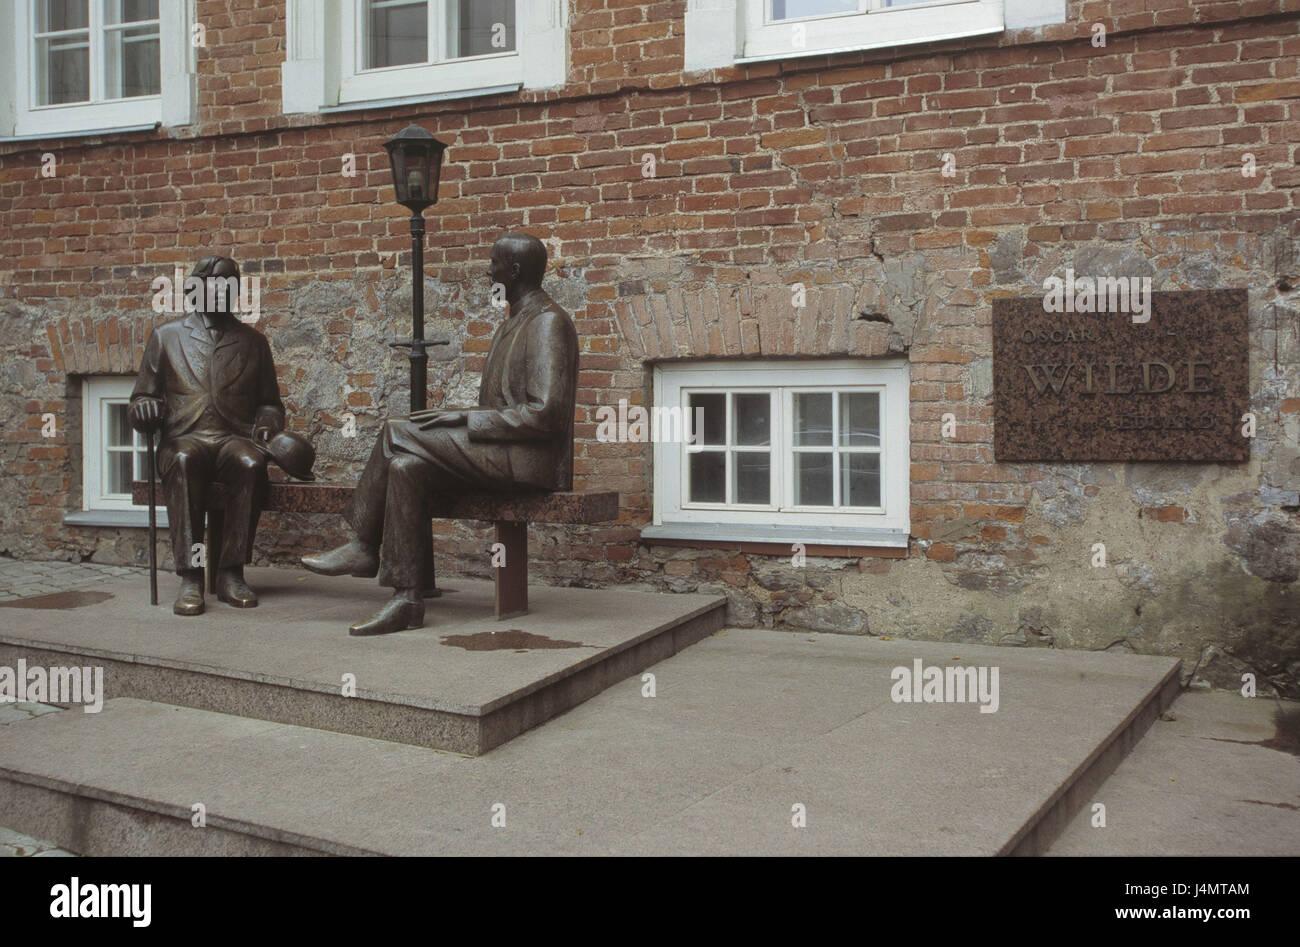 Estonia, Tartu, 'wild Irish pub', bronze characters, authors Eduard Wilde and Oscar wild Europe, Nordosteuropa, - Stock Image